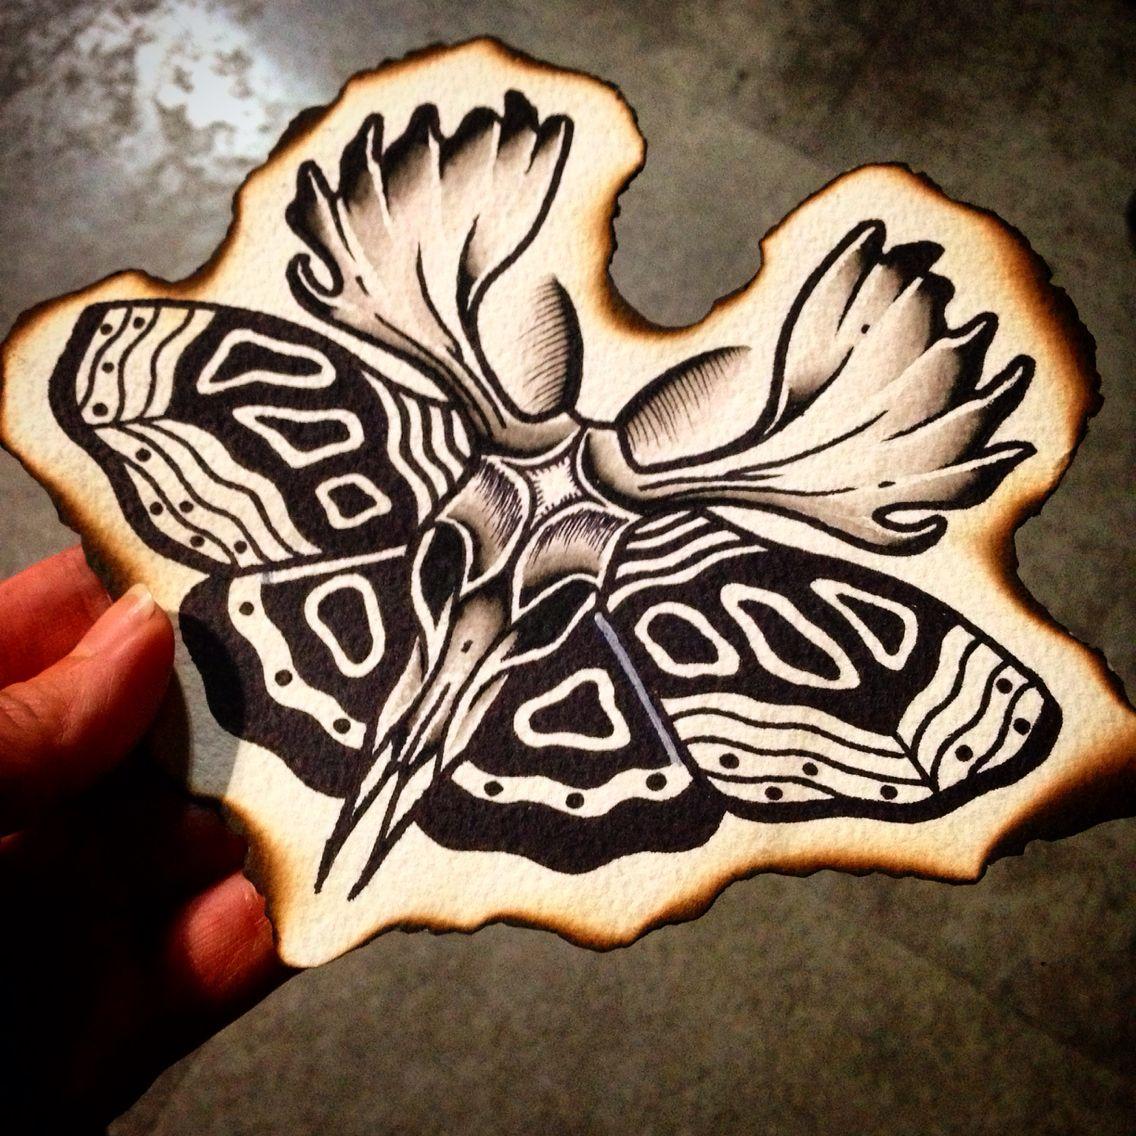 Traditional Butterfly Tattoo Flash: Black Work Tattoo Moth Tattoo Flash Water Color